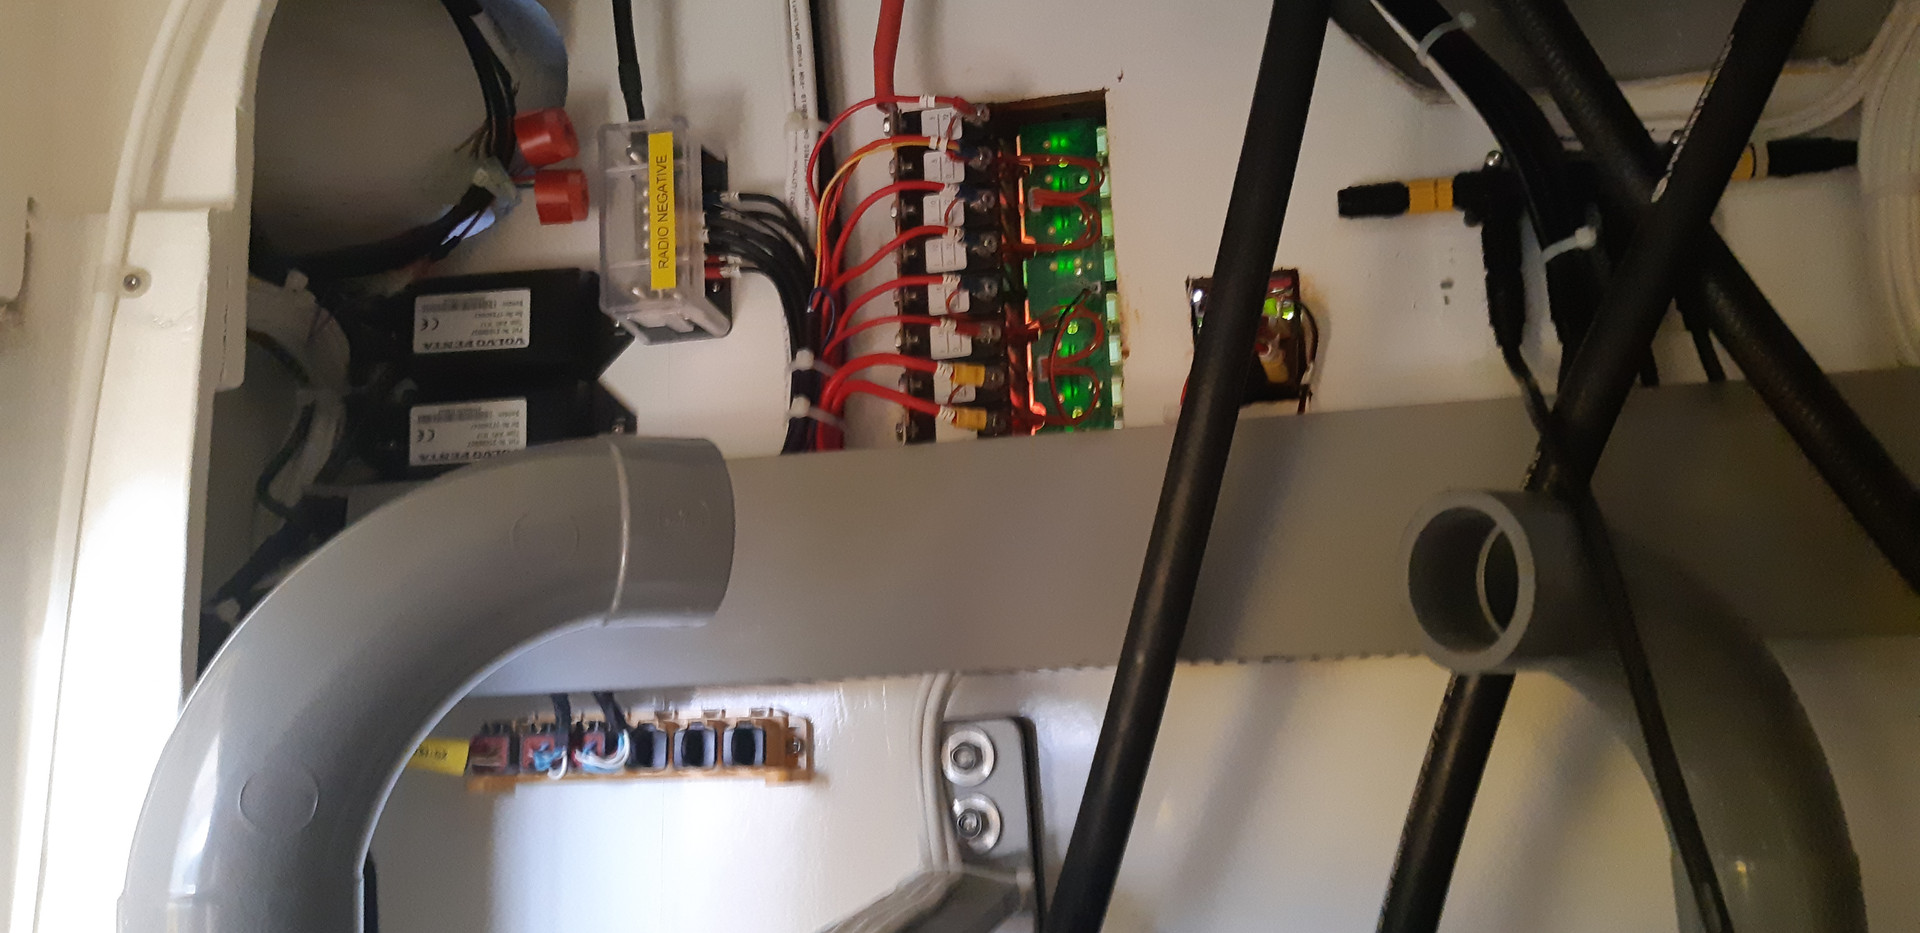 DC switchboard